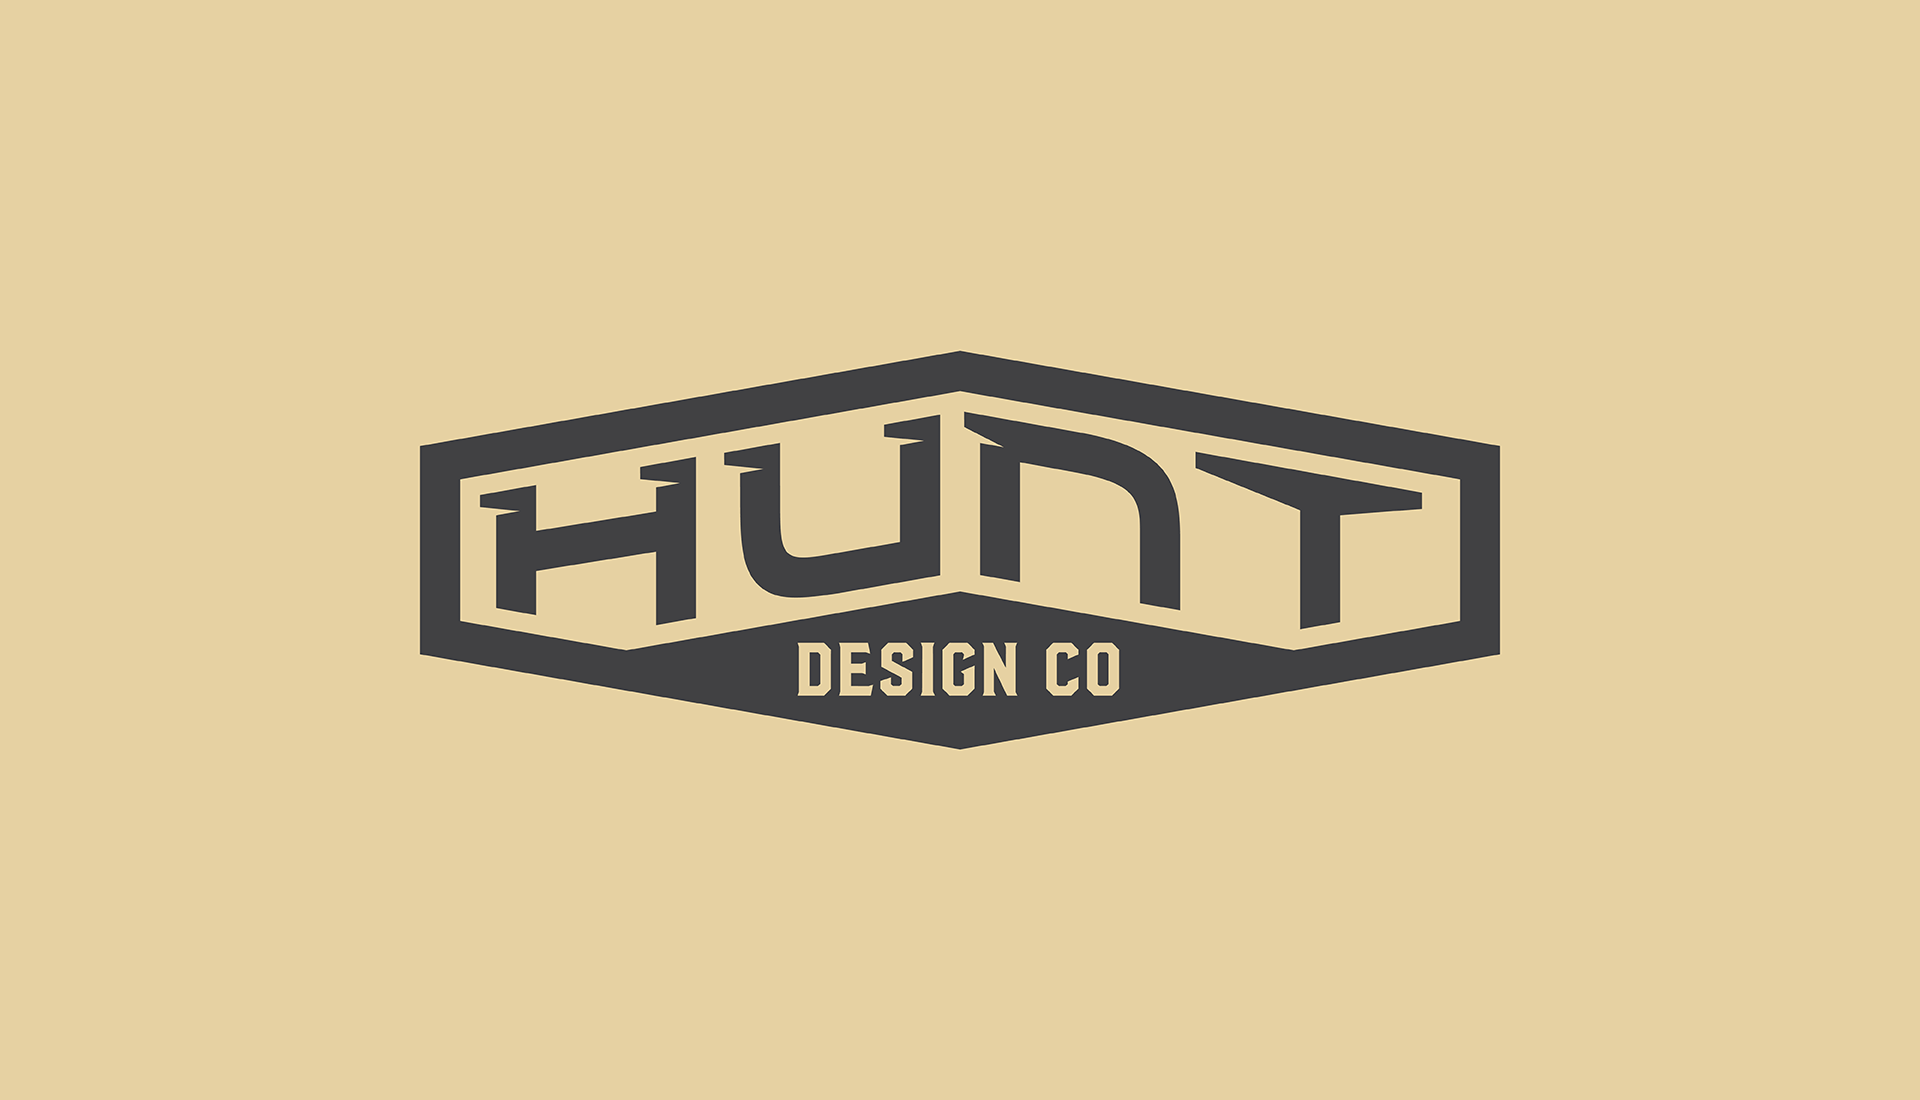 Hunt Design Co.   Tertiary Logo Design Concept